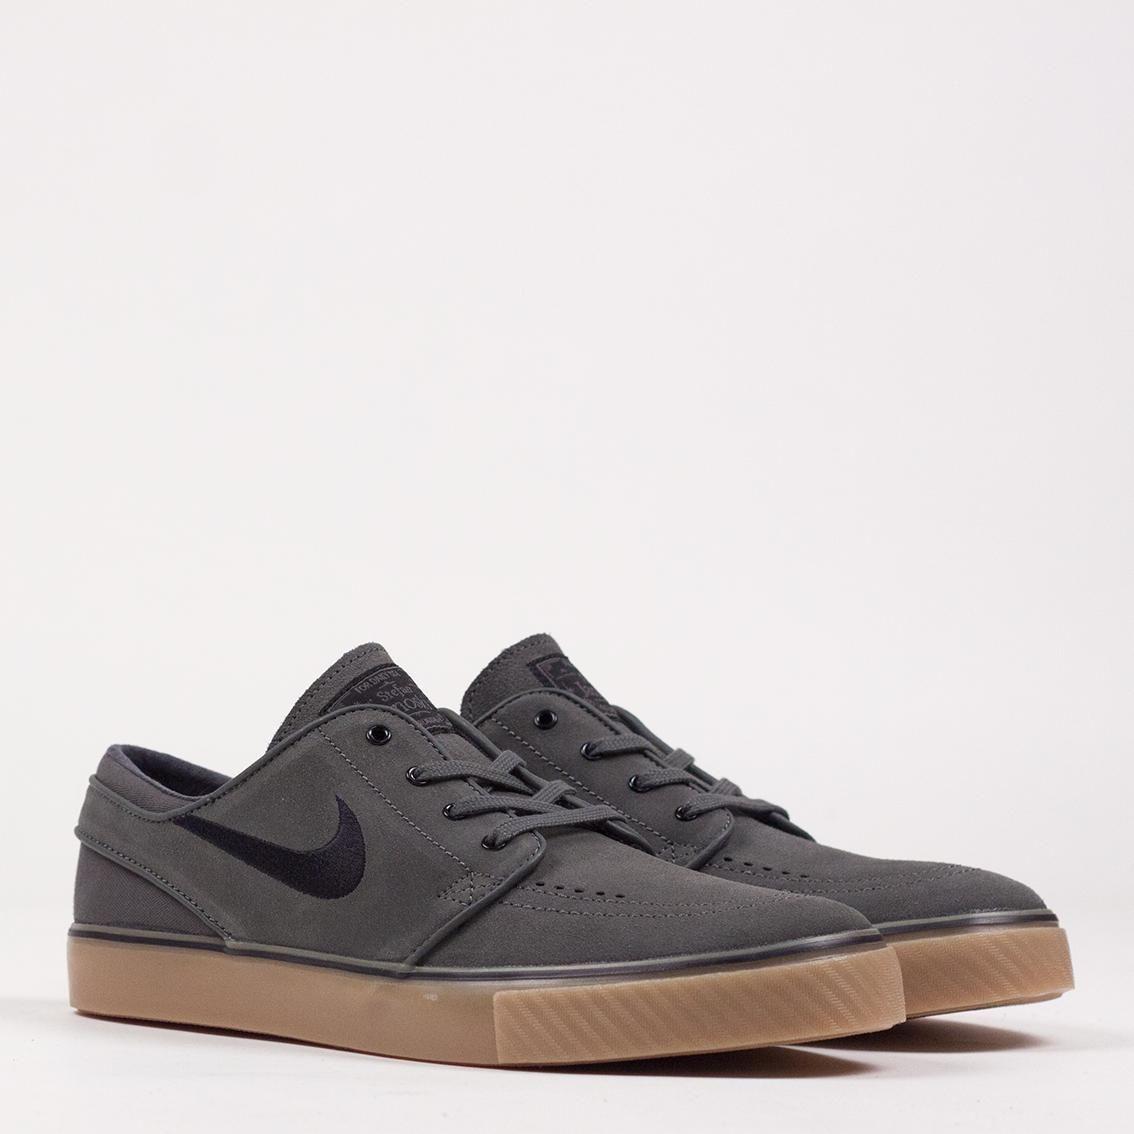 19a8de973fc9 Nike SB Stefan Janoski - Dark Base Grey Black Gum Light Brown